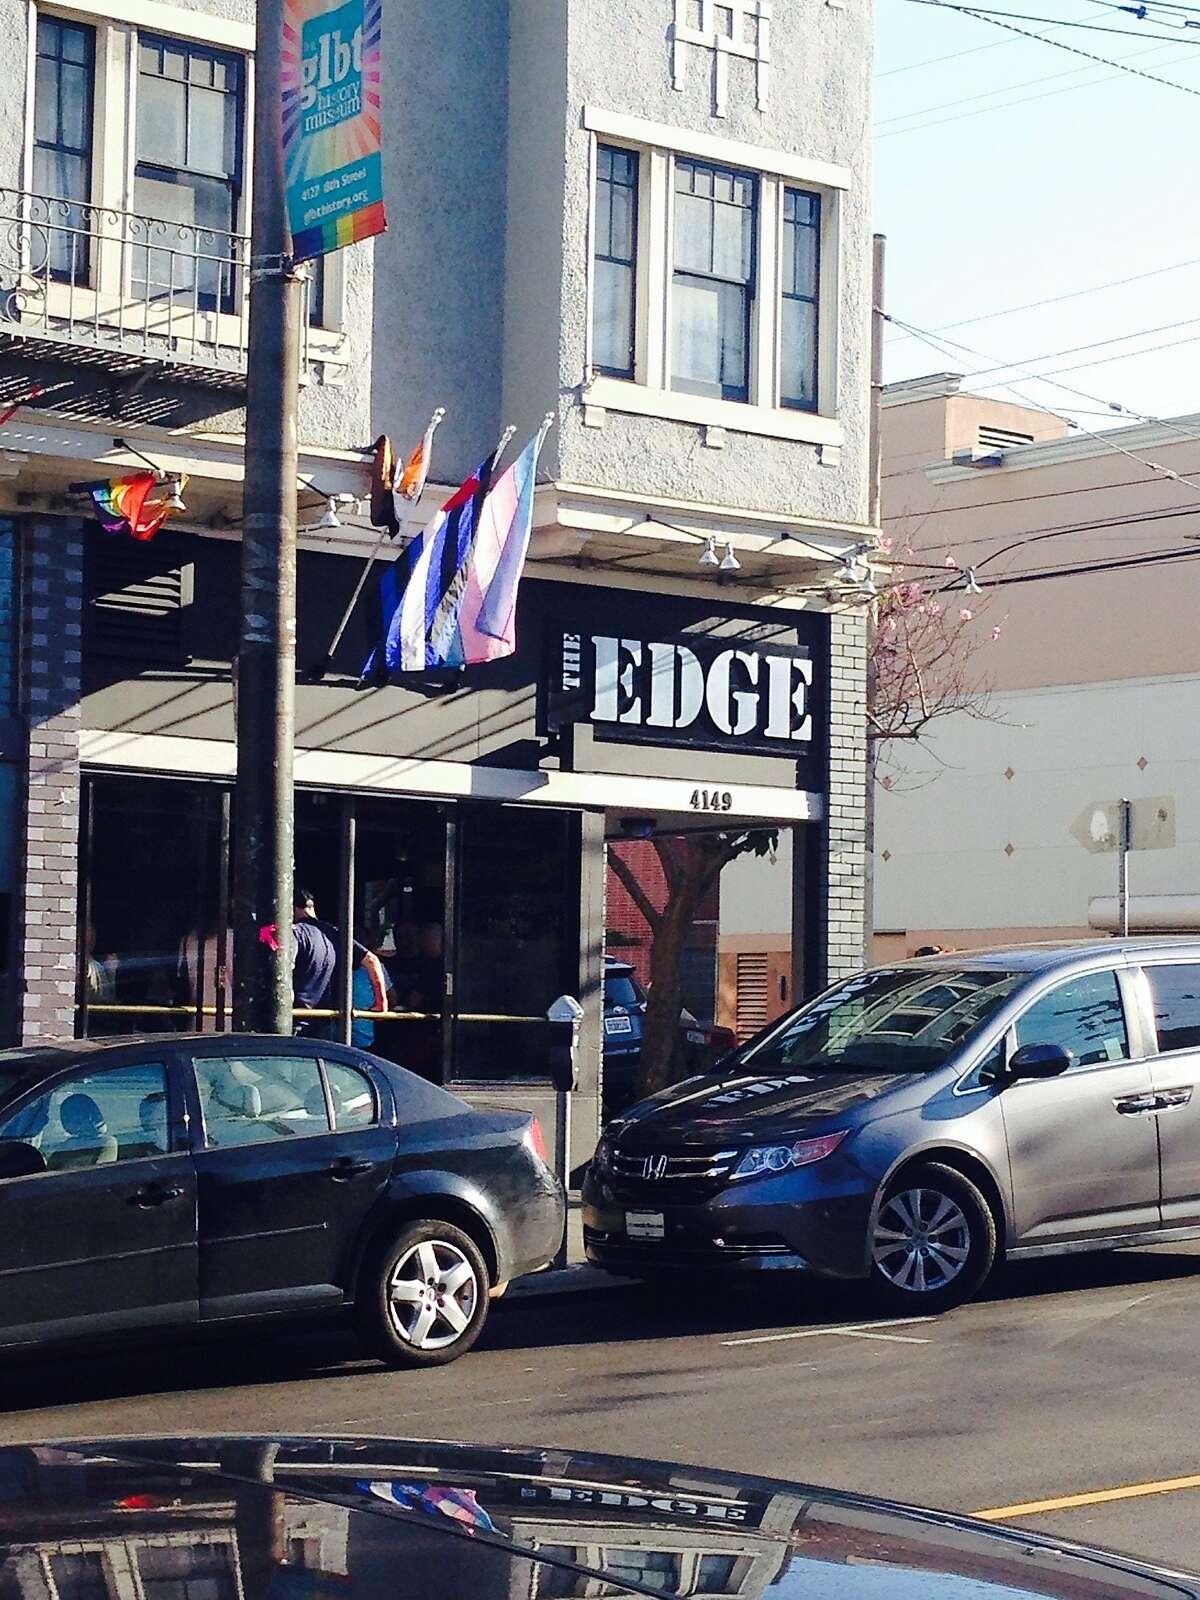 Castro gay bar The Edge, June, 2015.